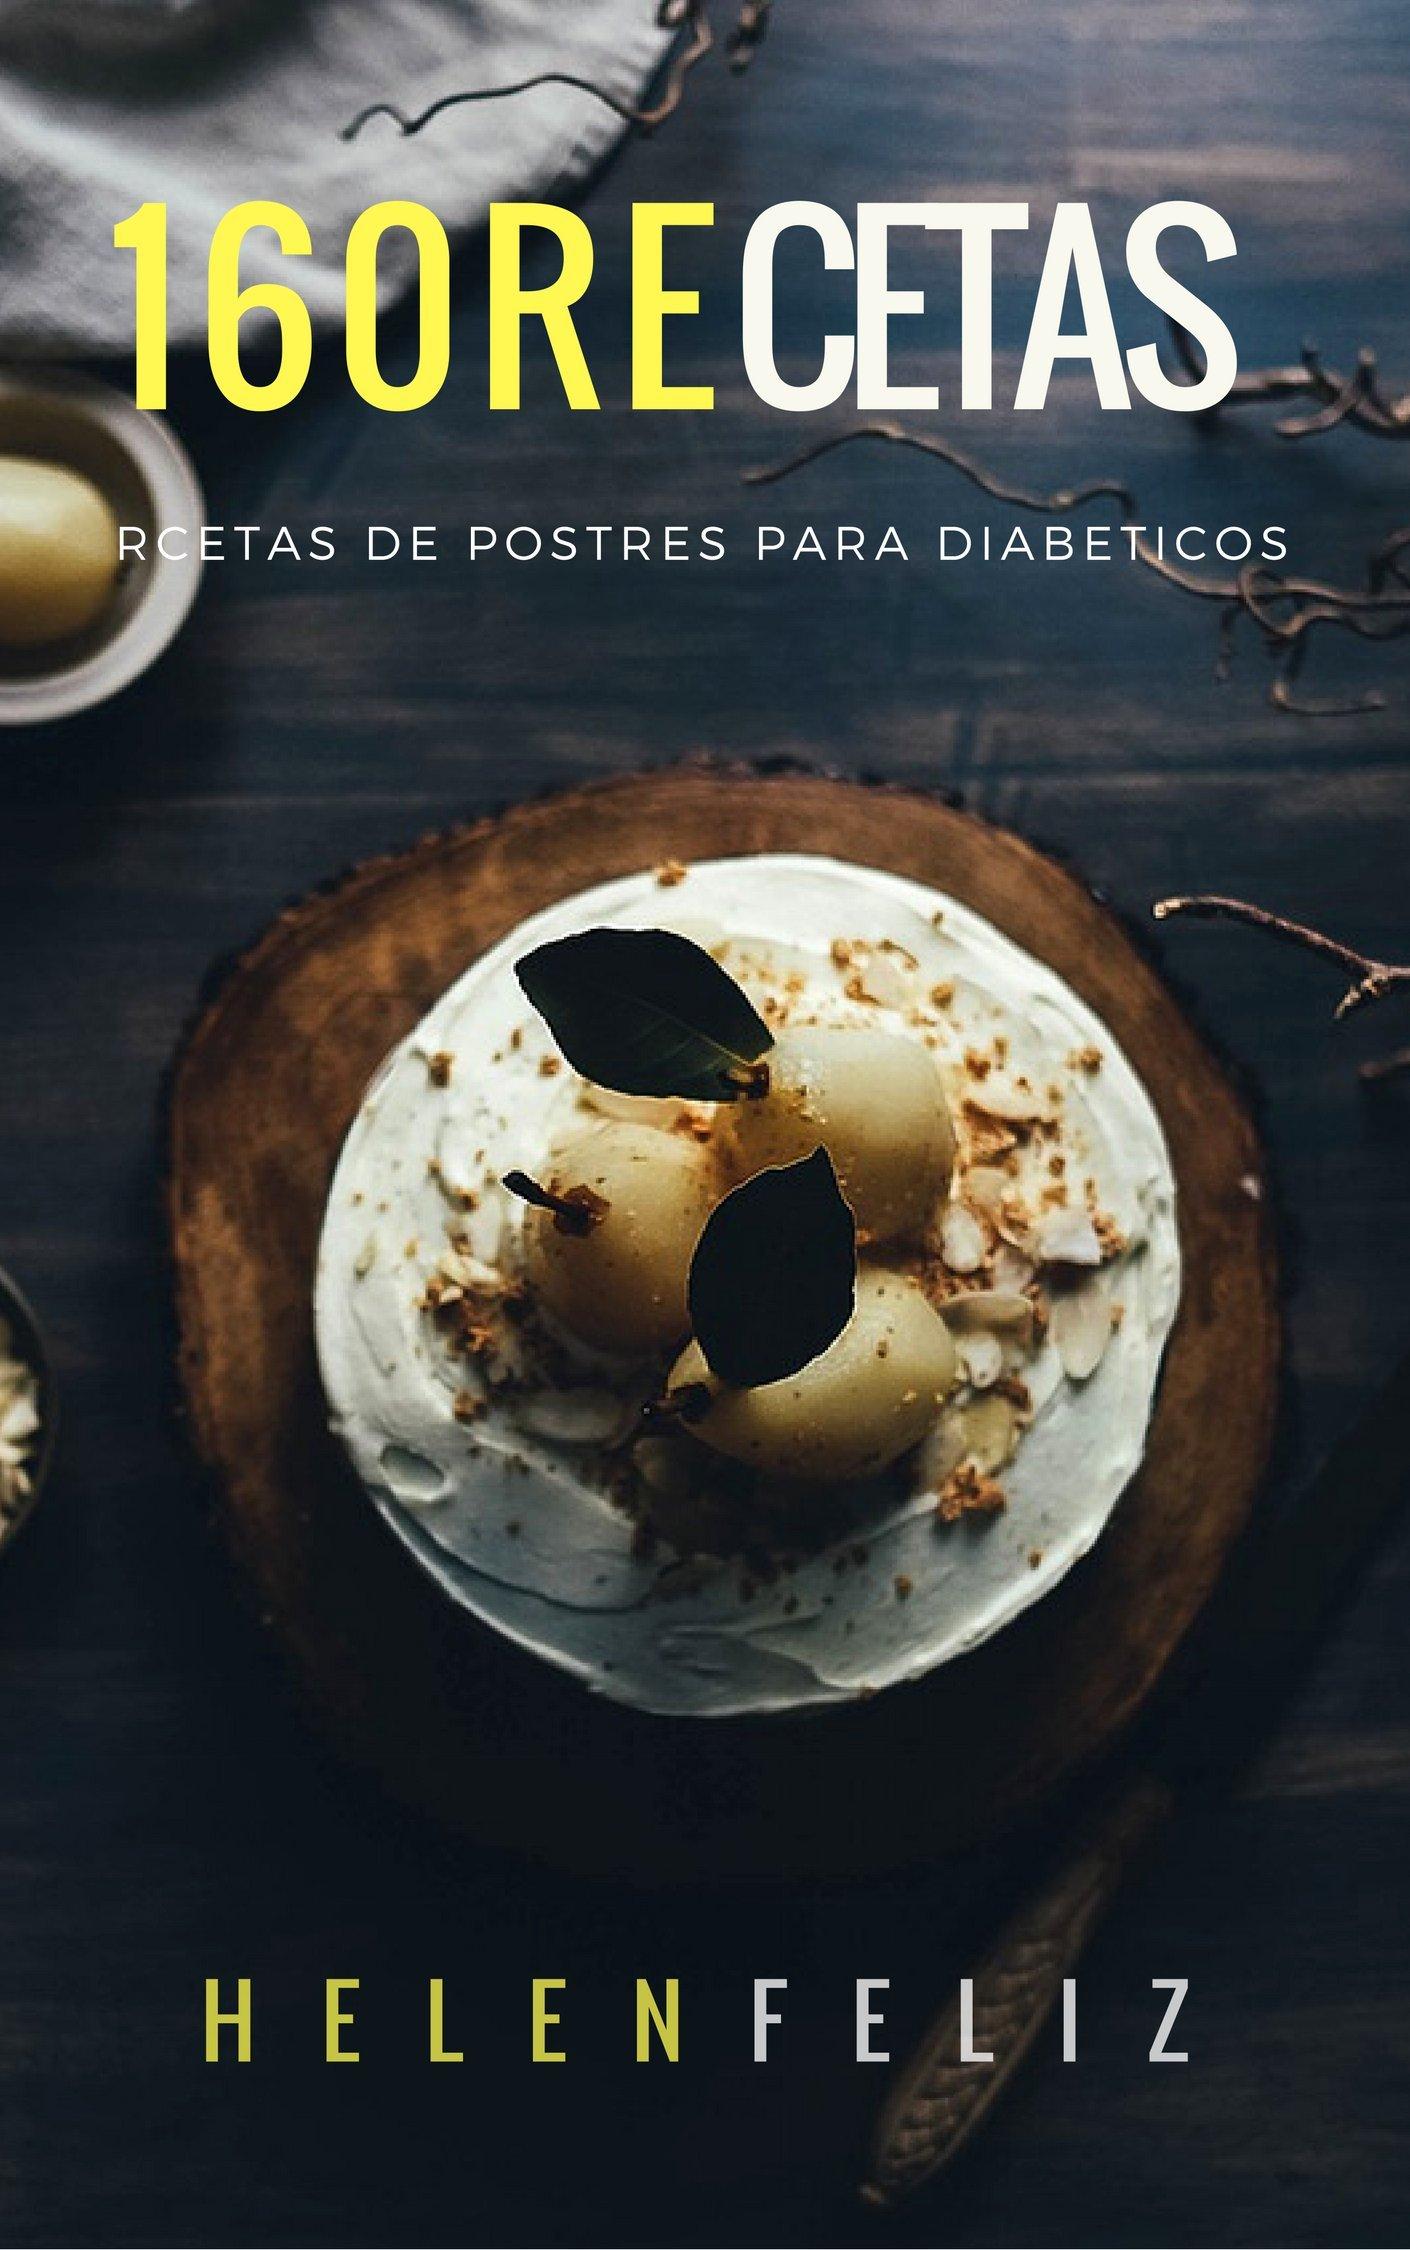 160 Recetas de Postres para Diabeticos (Spanish)